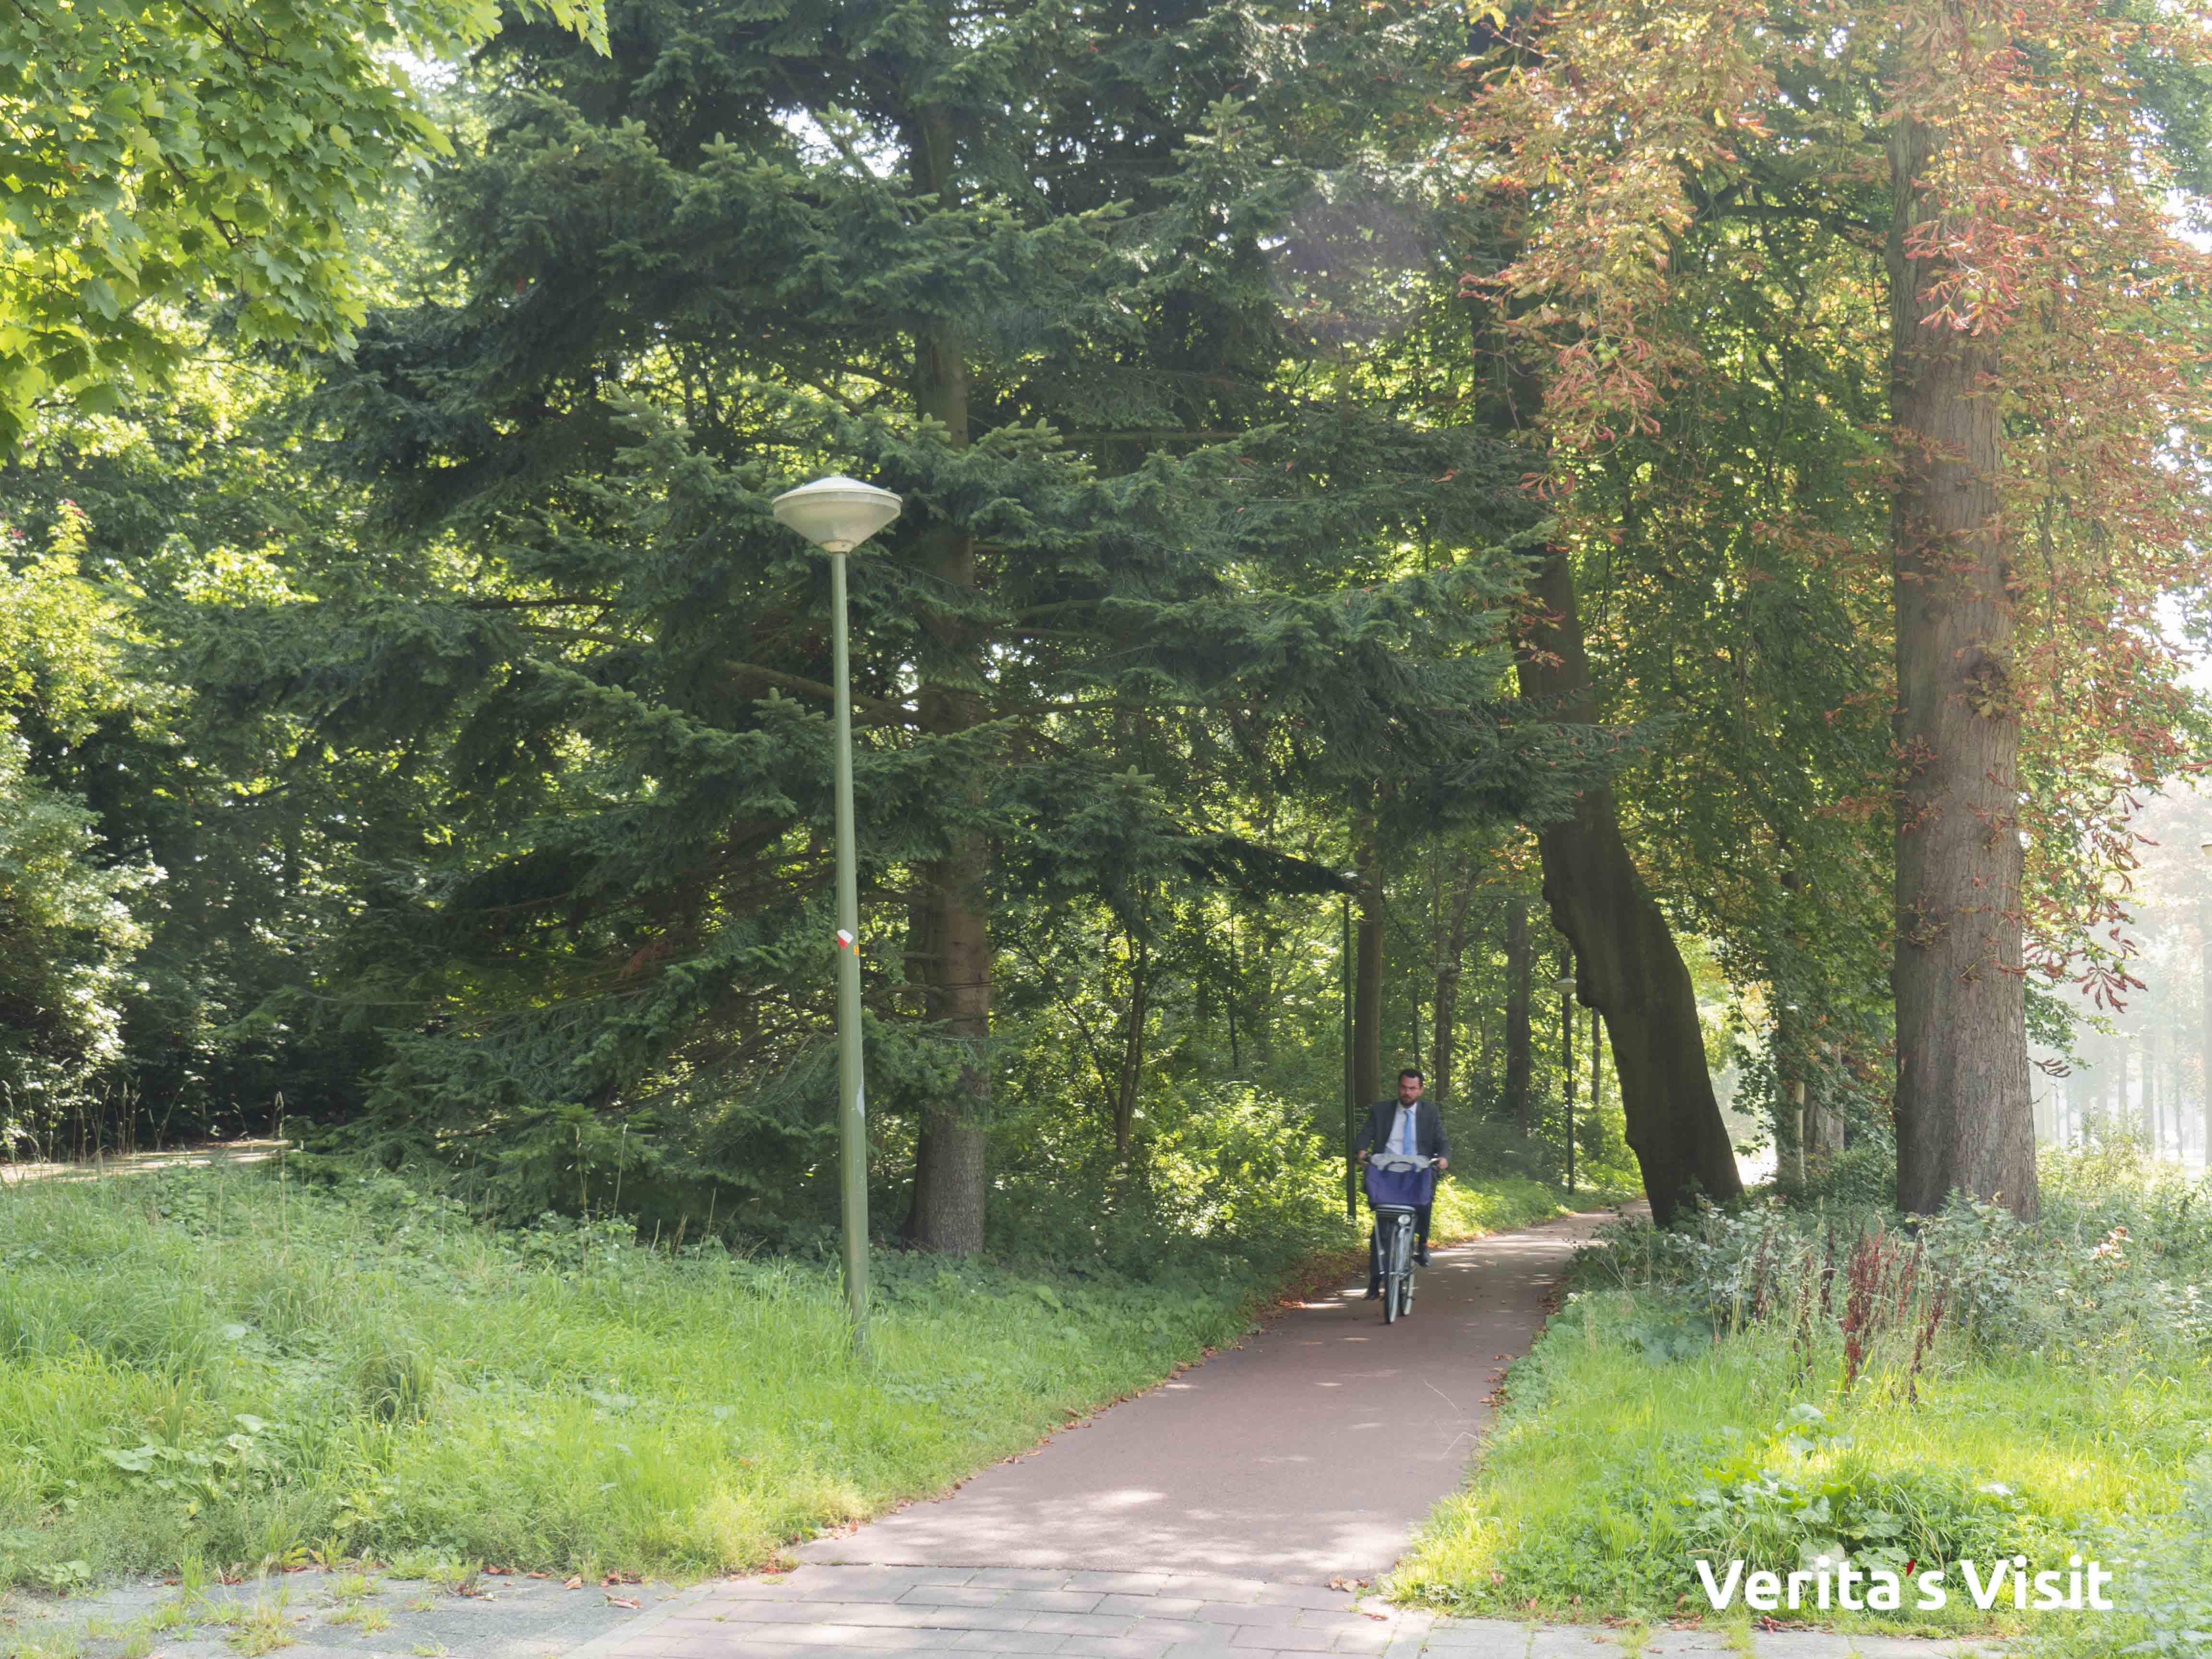 Cycling Verita's Visit Hague nature Haag natuur fietstocht